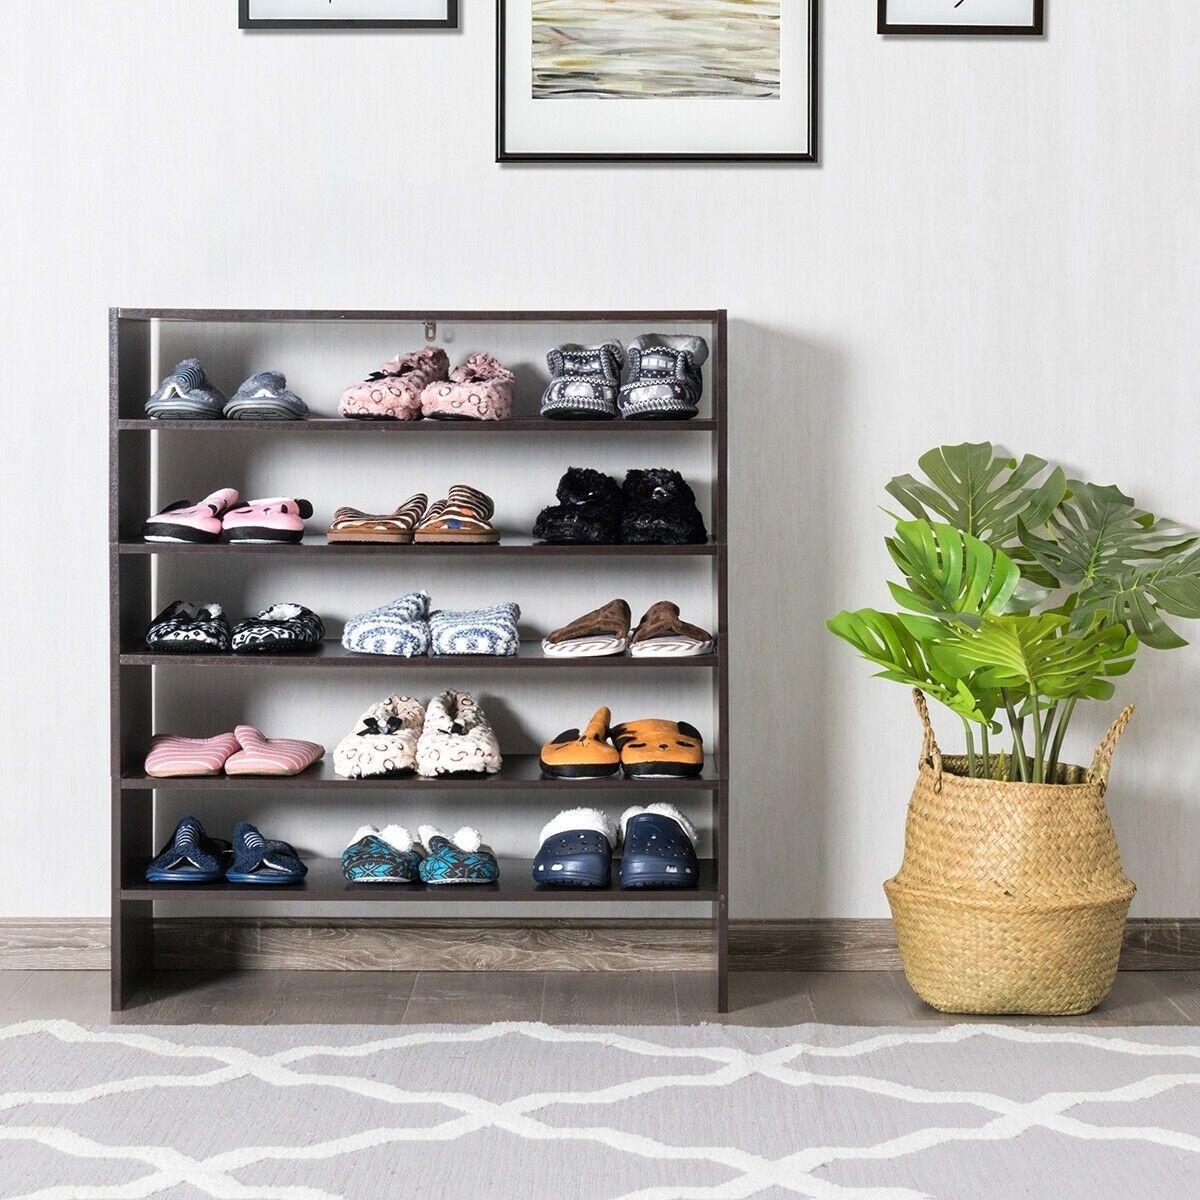 4d54213022cd16b908b7e0df4546c2e8 - Better Homes And Gardens 2 Tier Stackable Shoe Rack